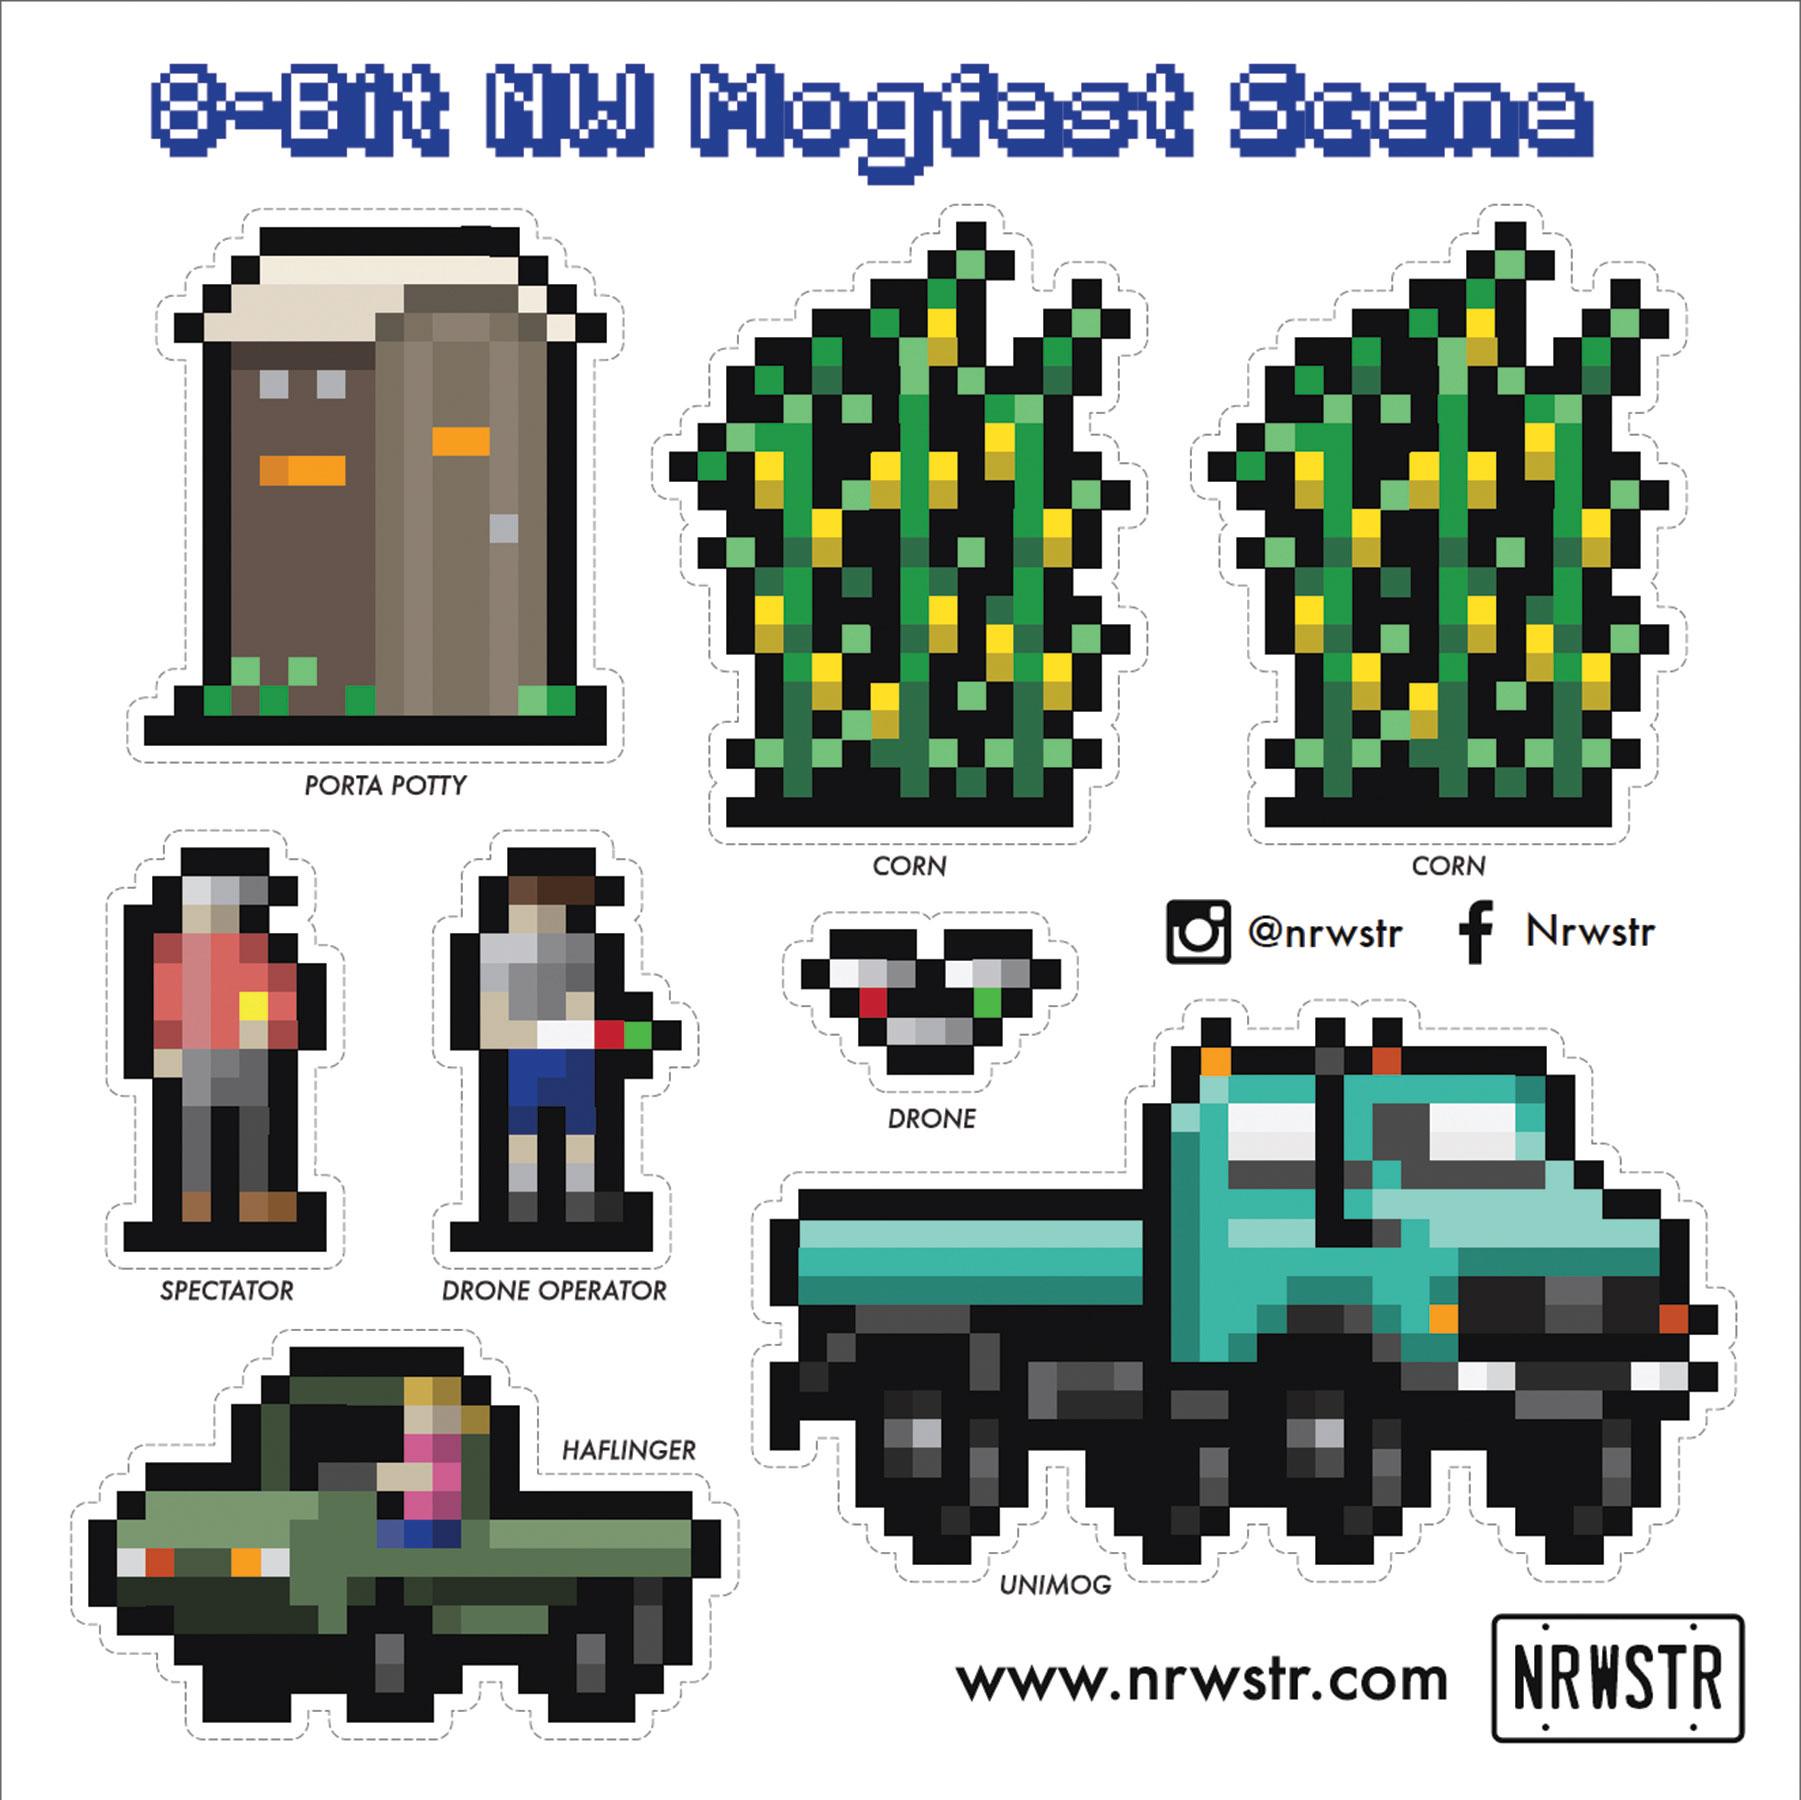 8-bit-nw-mogfest-scene-6x6-print-final2-sm.jpg